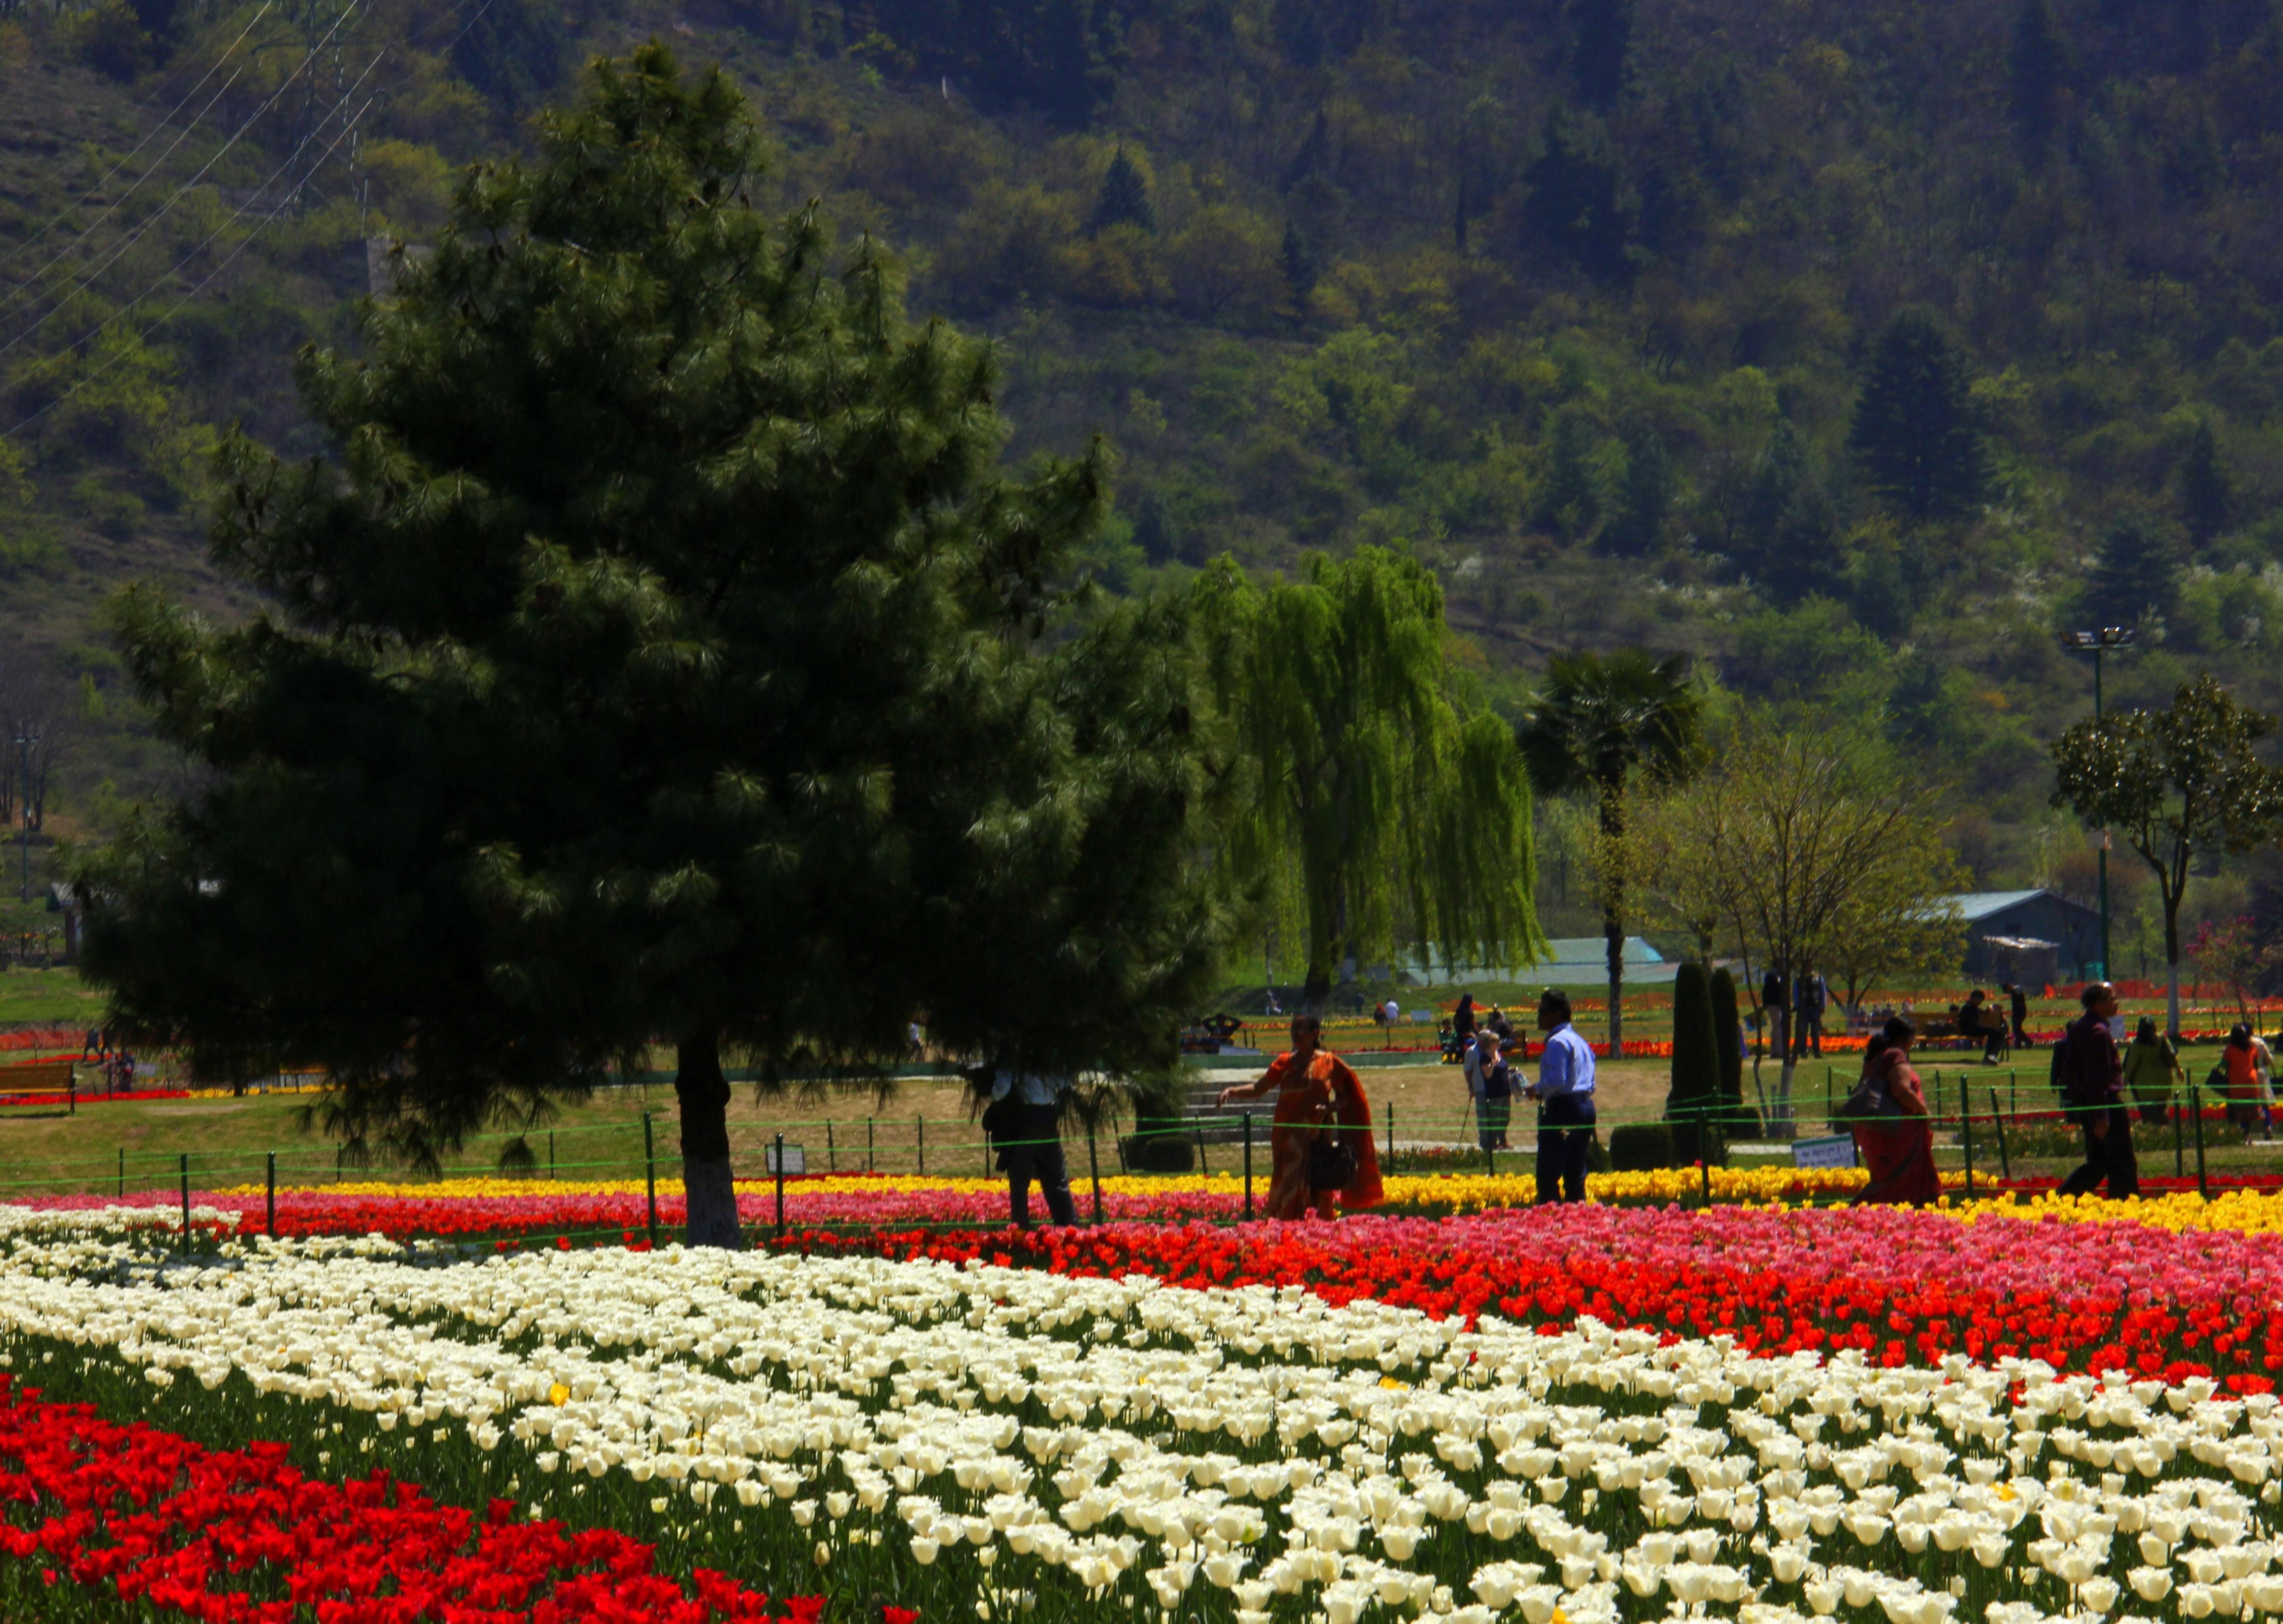 srinagar tulip festival is the biggest in asia